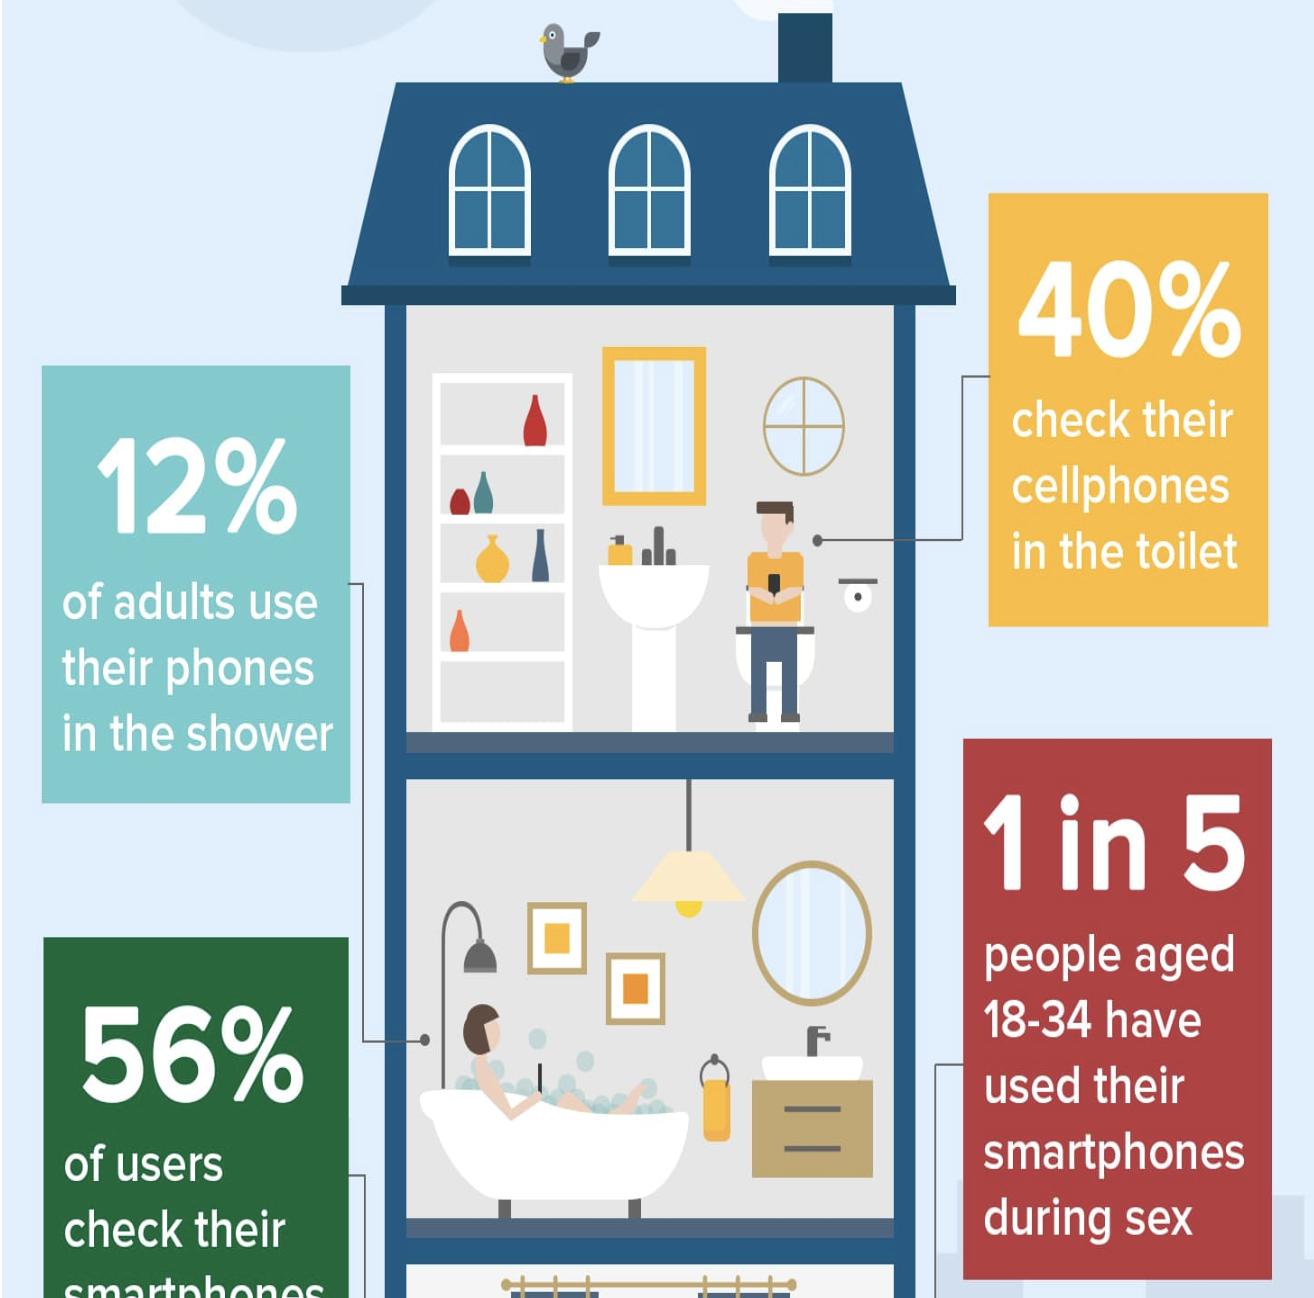 Good infographic design